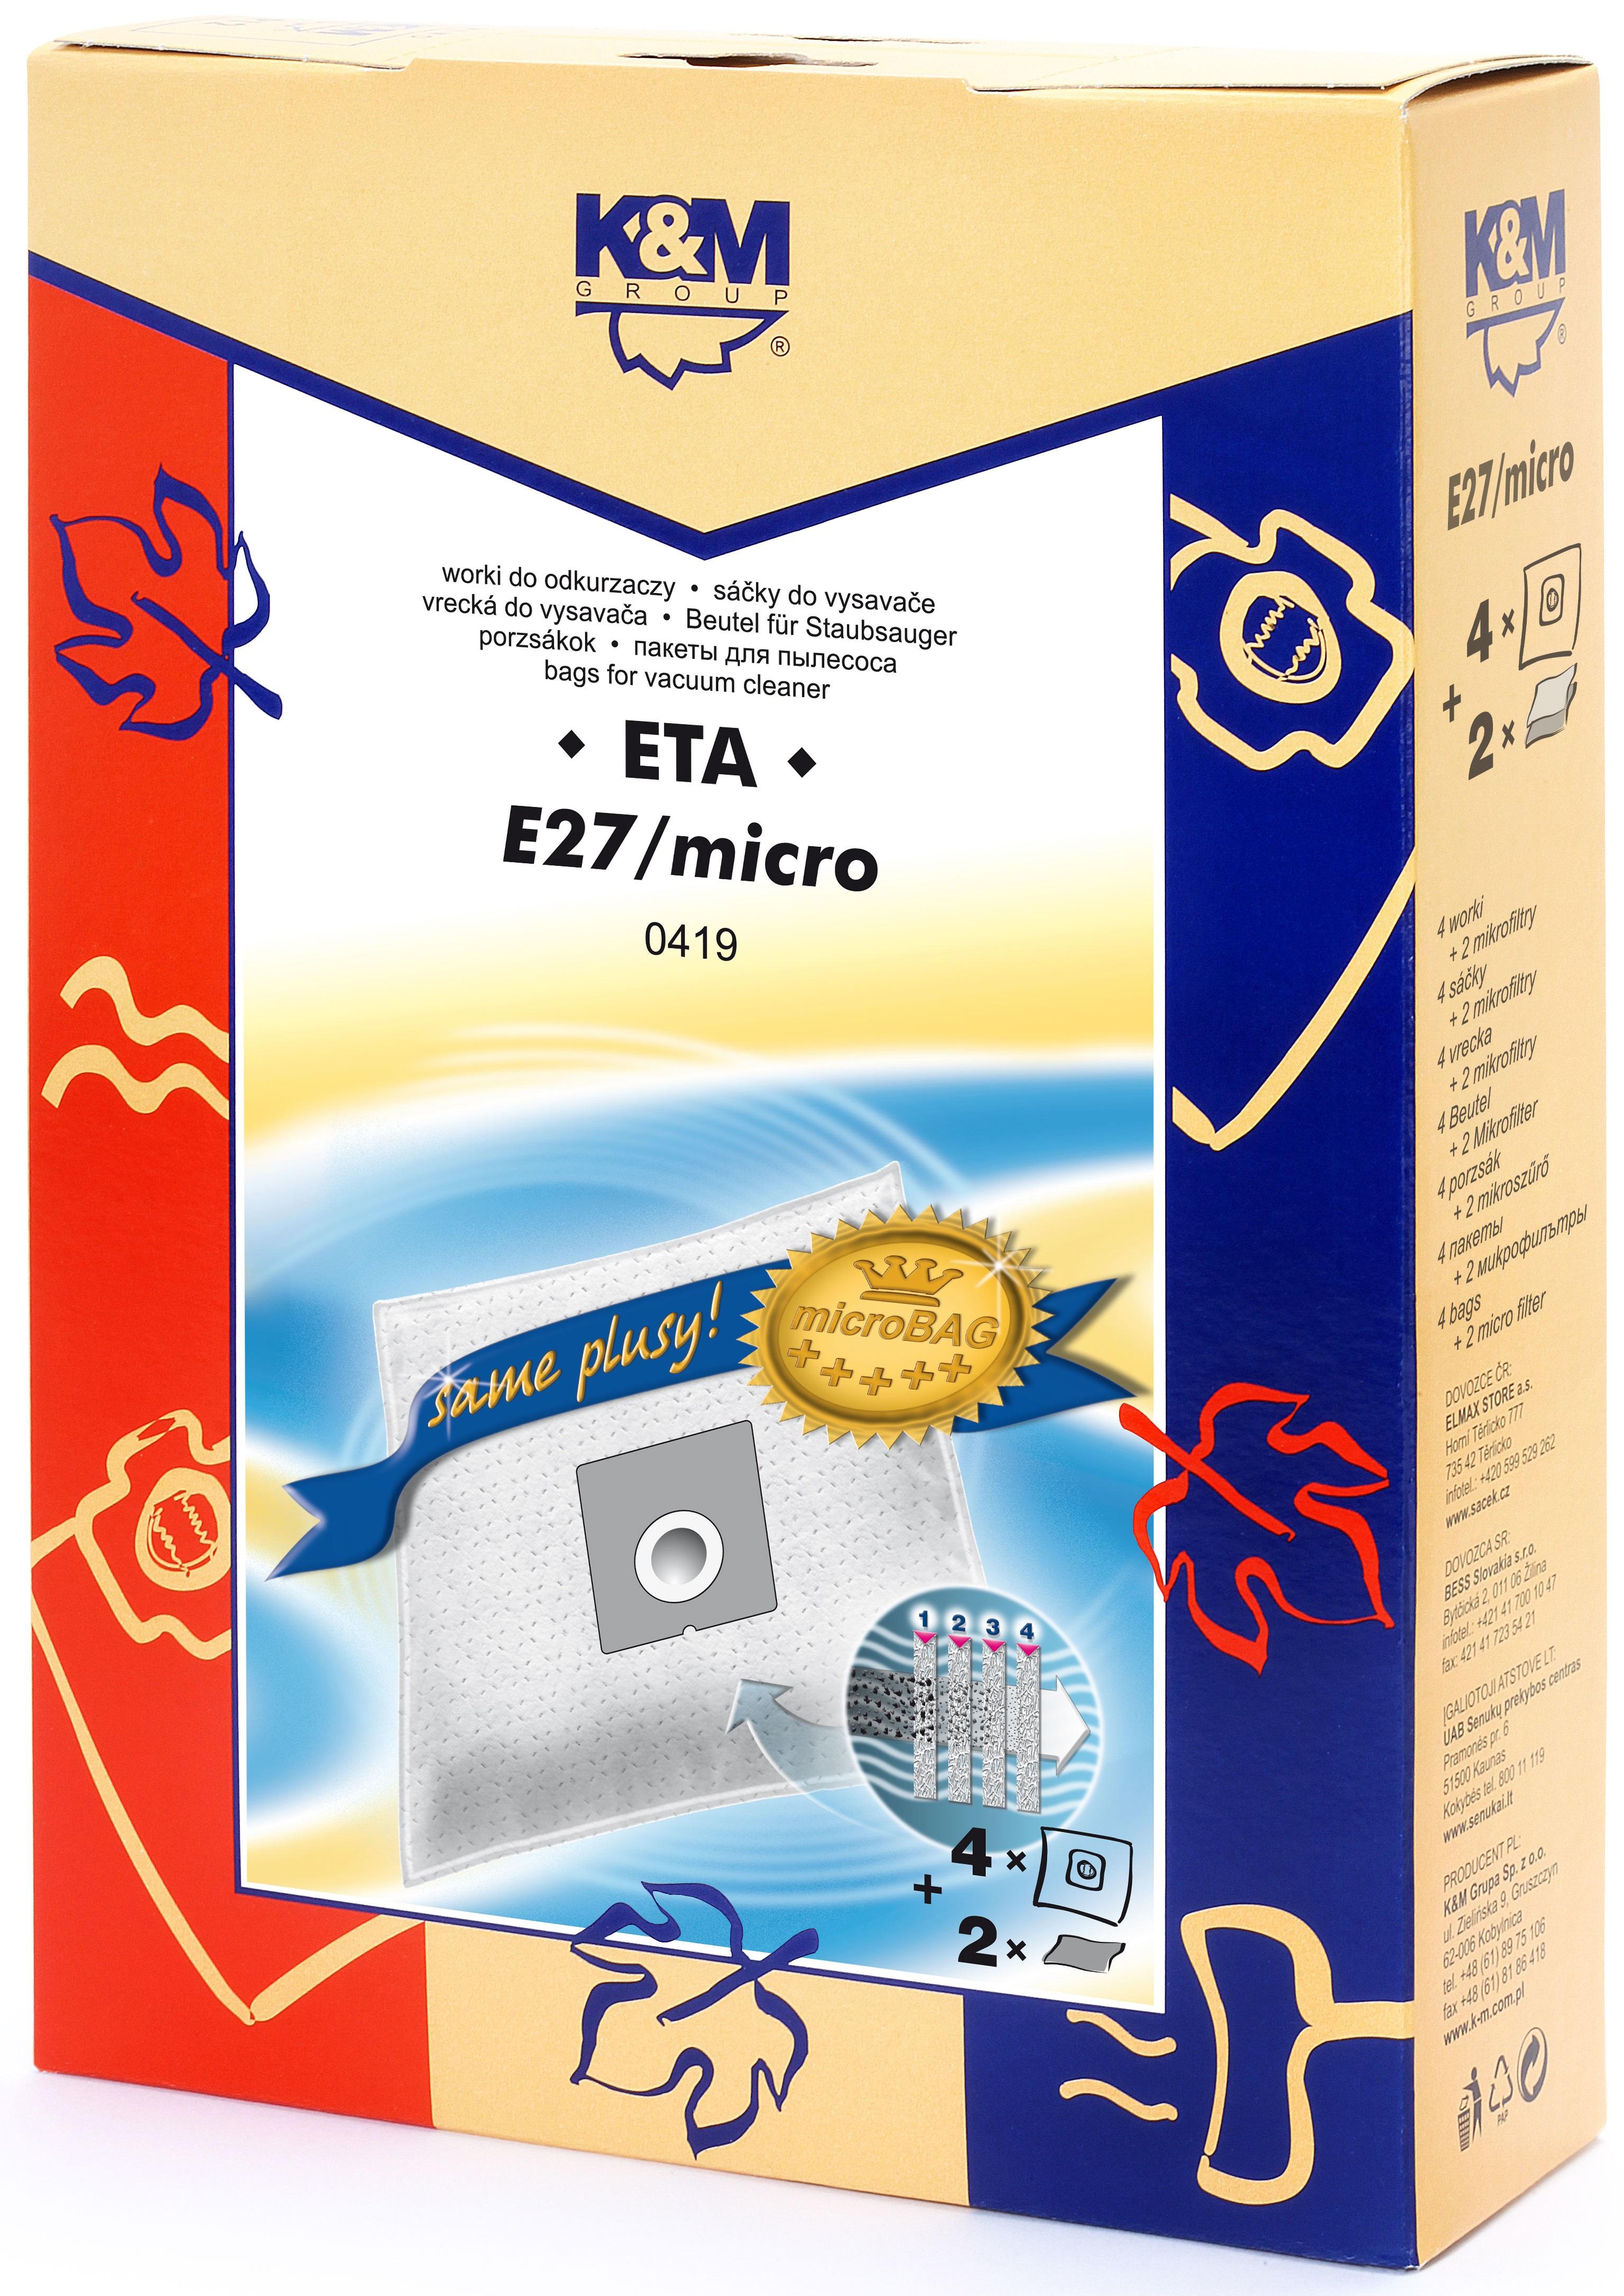 Sac aspirator ETA 419, sintetic, 4X saci + 2 filtre, K&M 0